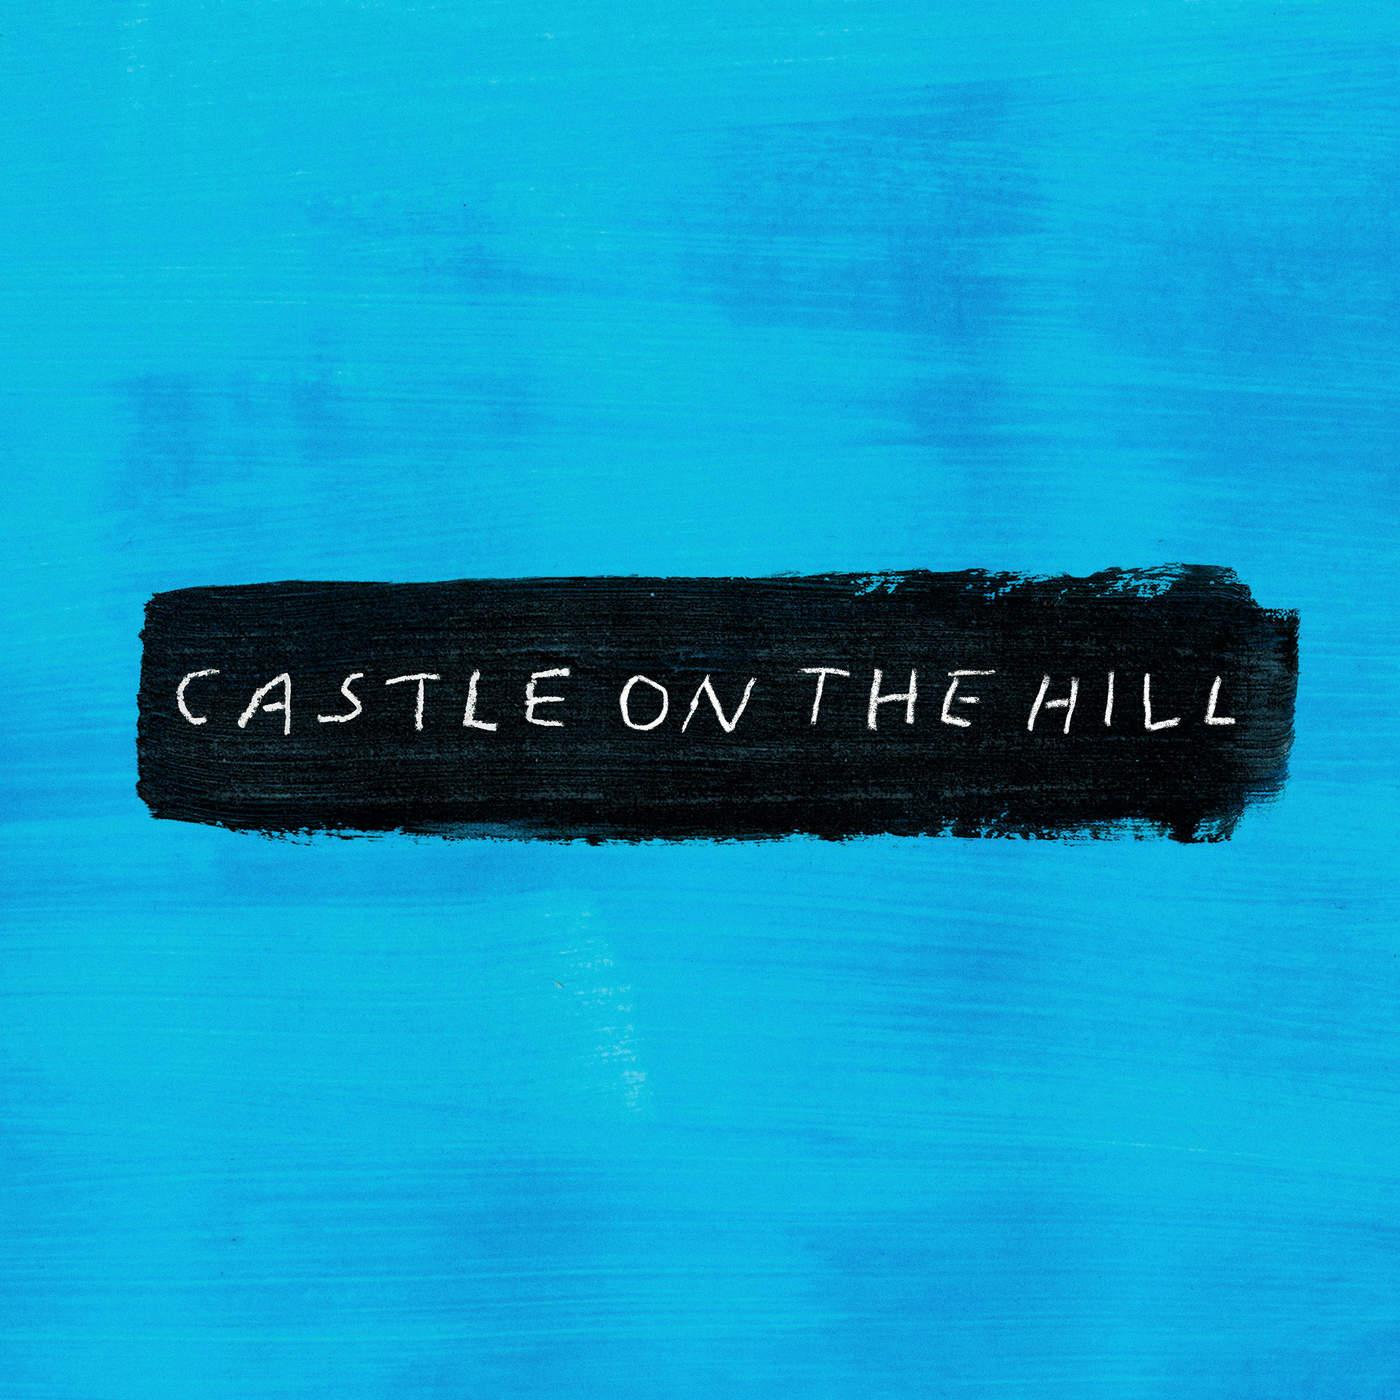 Ed Sheeran - Castle on the Hill (Seeb Remix) - Single Cover